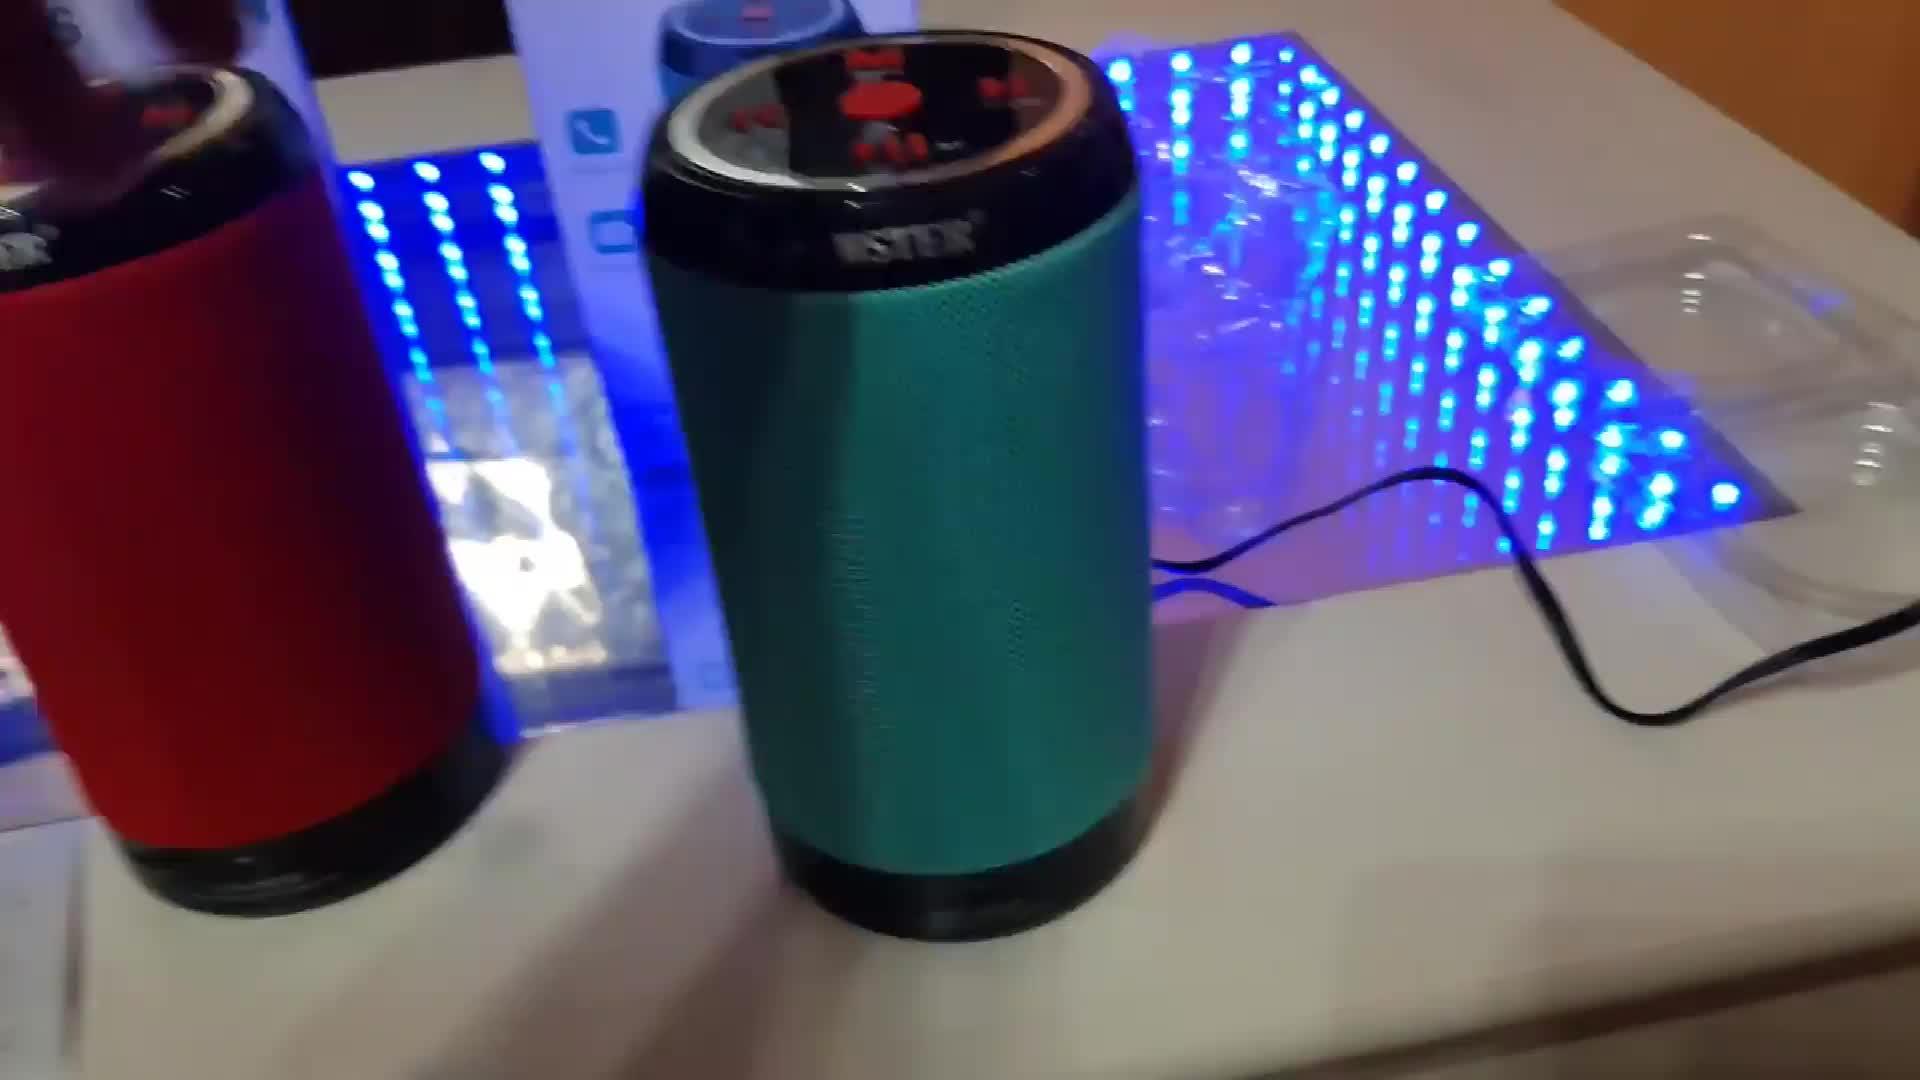 Yeni gadget taşınabilir tf kart oynatma kablosuz hoparlör Bluetooth küçük ses kutusu